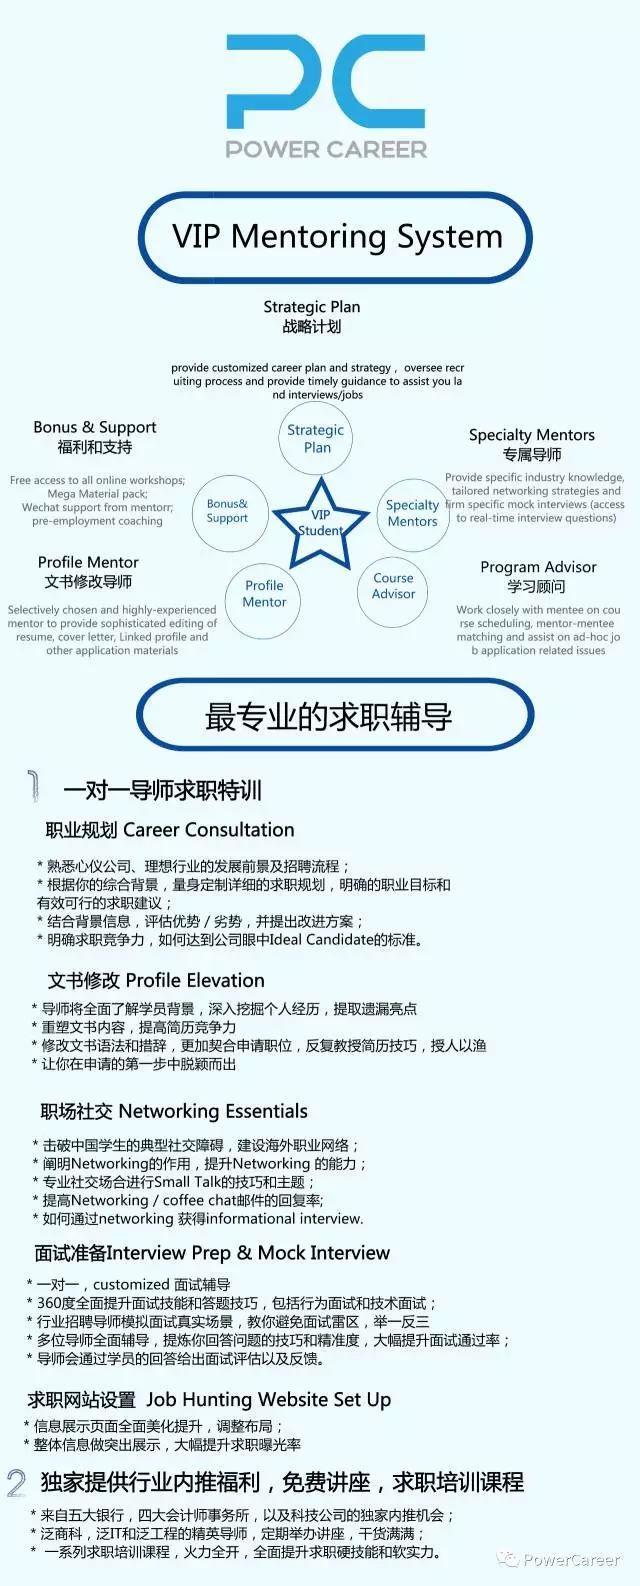 PC Academy | 社交福利课:教你怎样进行高效的Networking-上(二)